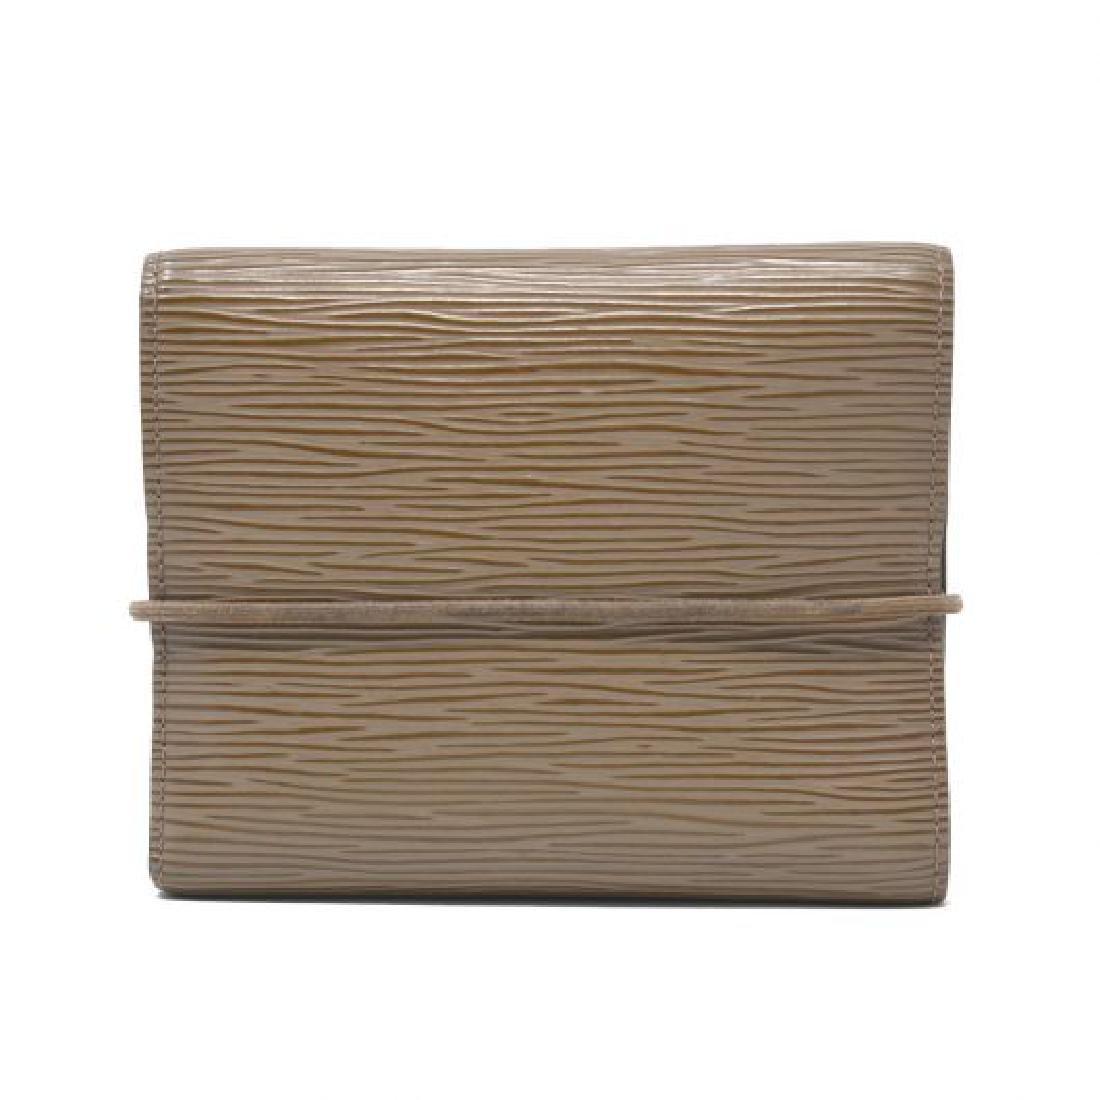 Louis Vuitton  Epi Leather Wallet - 2